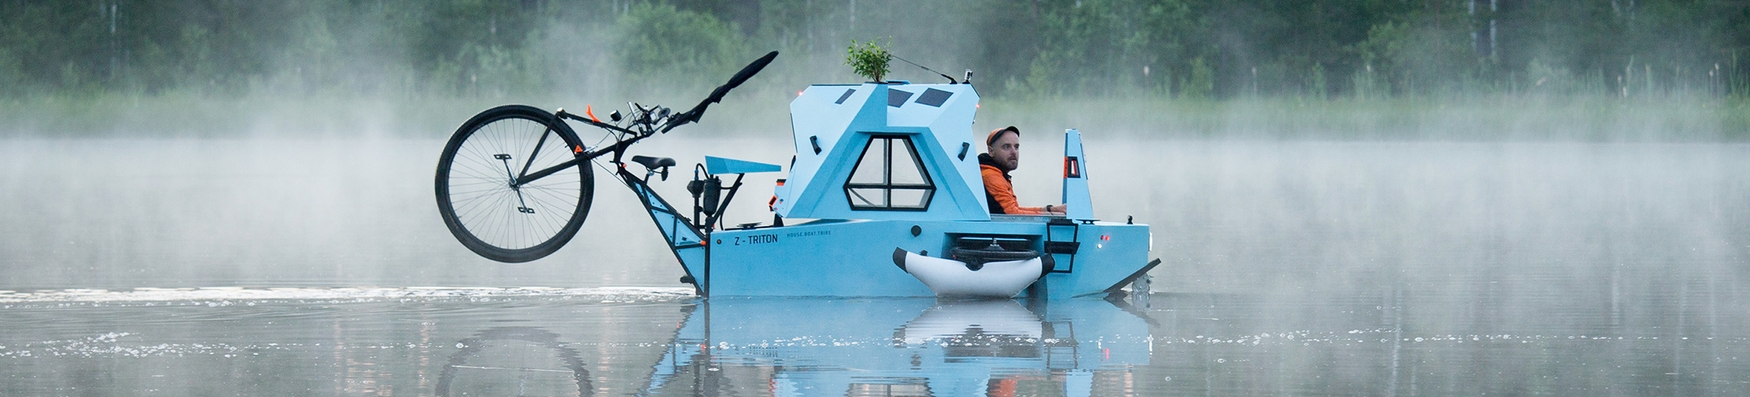 Z-Triton. Amphibious E-Camper. House-Boat-Trike.